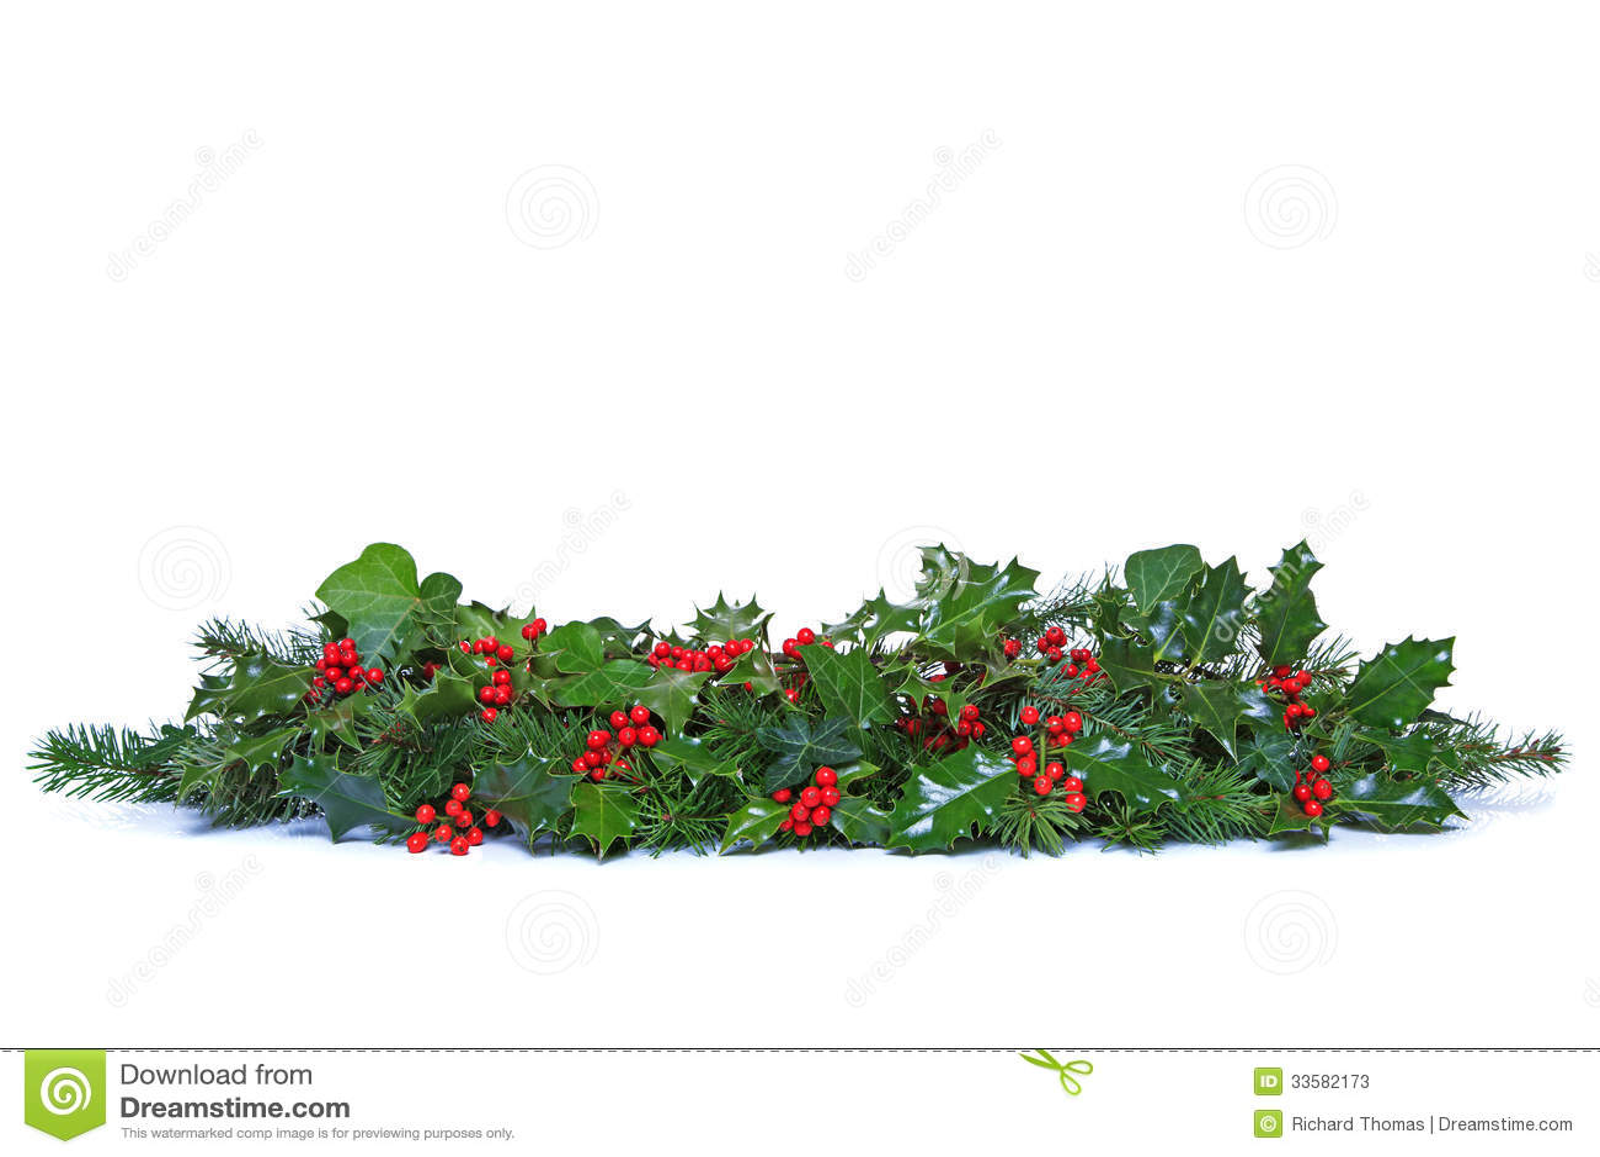 Holly Garland Clip Art Holly and ivy christmas